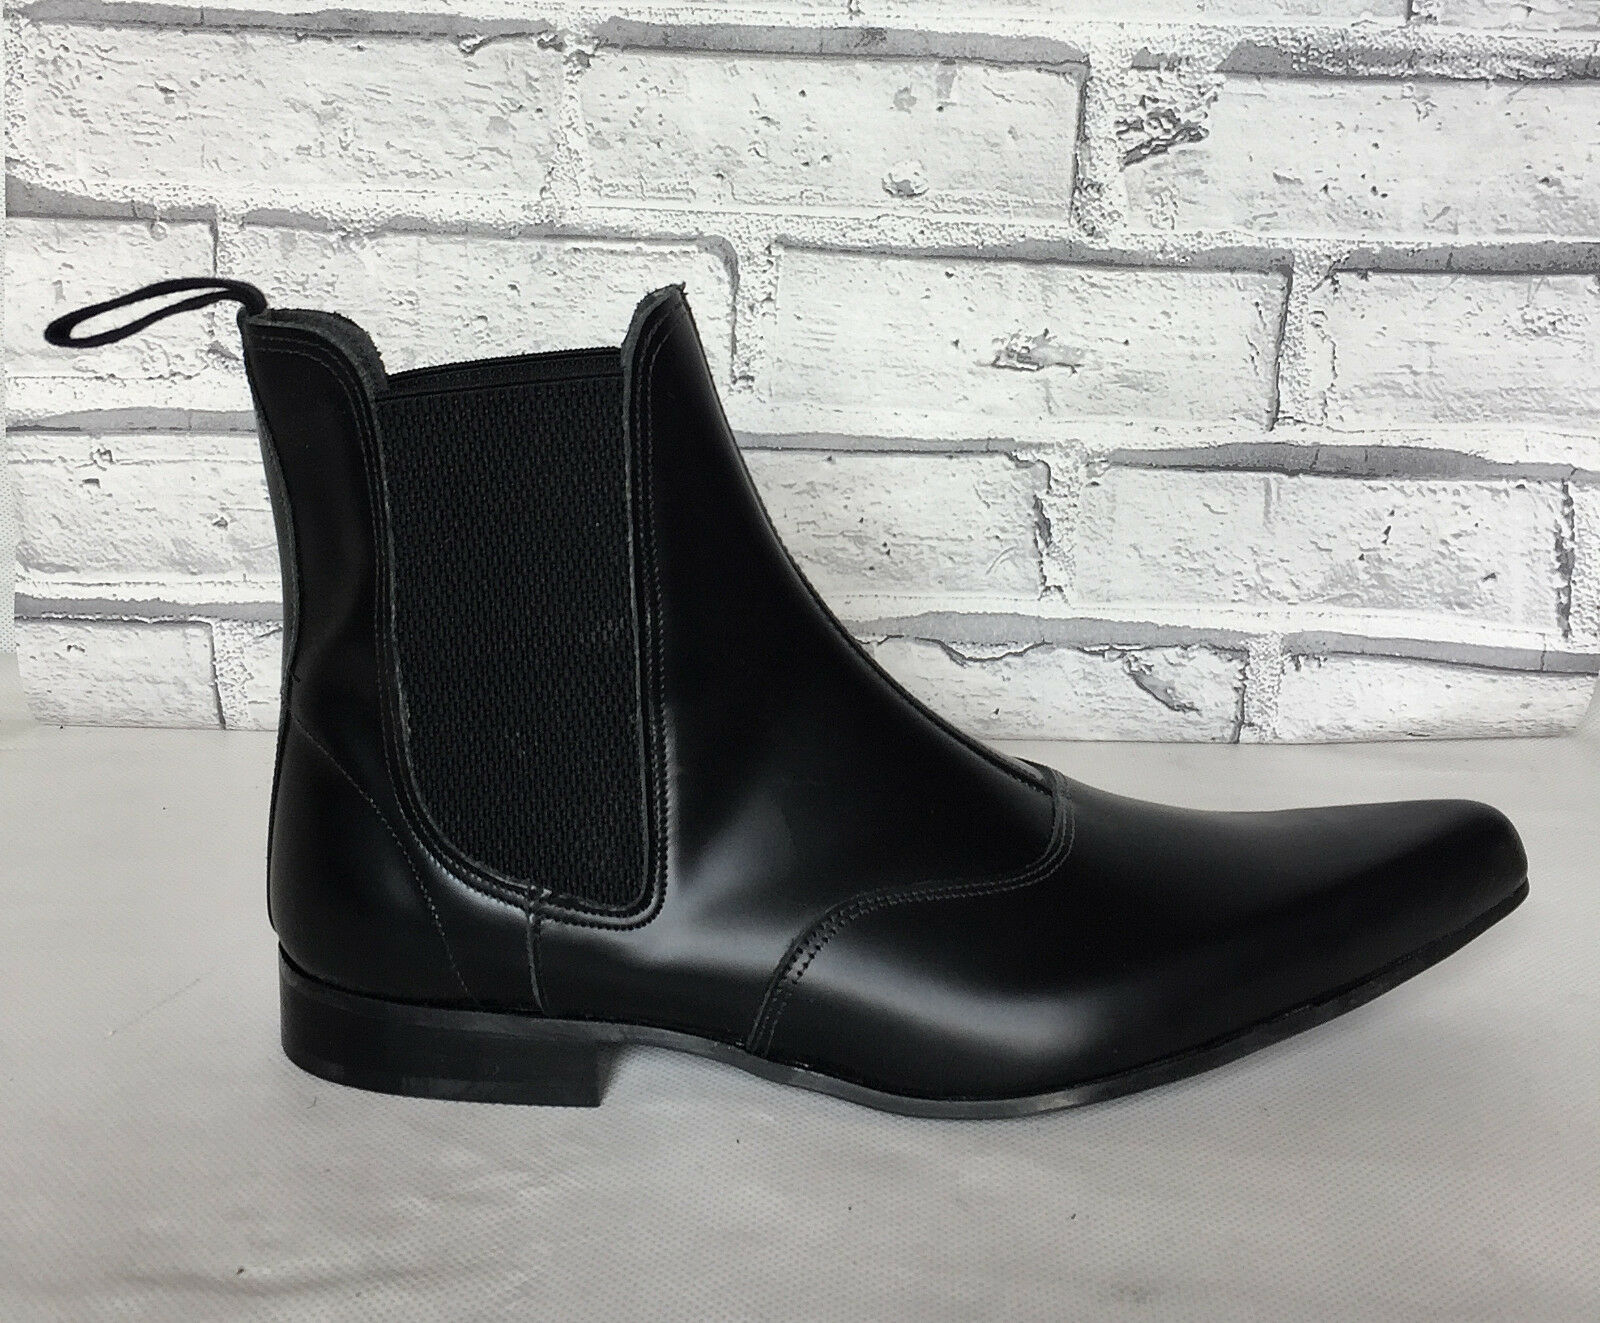 Uomo Nero Pelle Stivali Mocassini Beatles Gusset Chelsea Beatles Mocassini Boots 1d1634